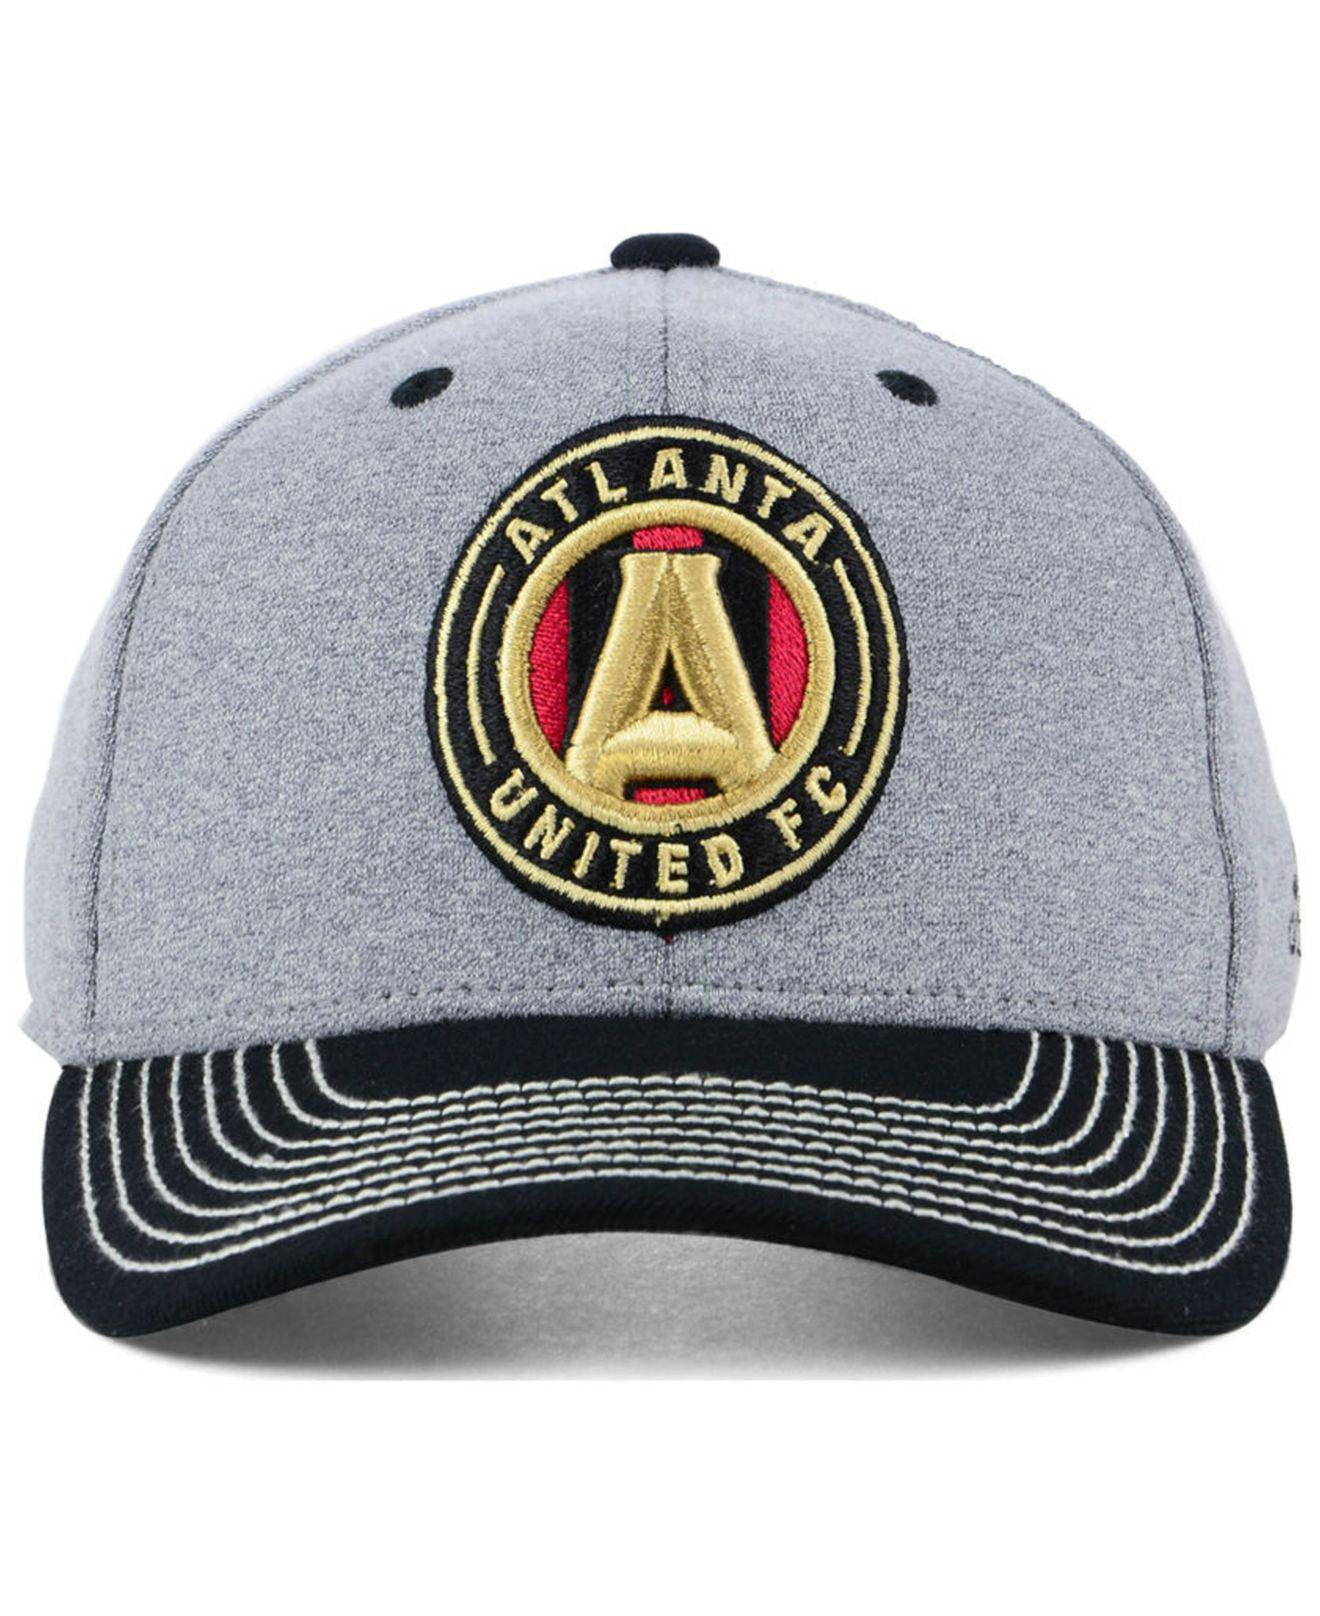 f1e316f59c41a ... new style lyst adidas atlanta united fc structure adjustable cap for  men acc68 8dbea